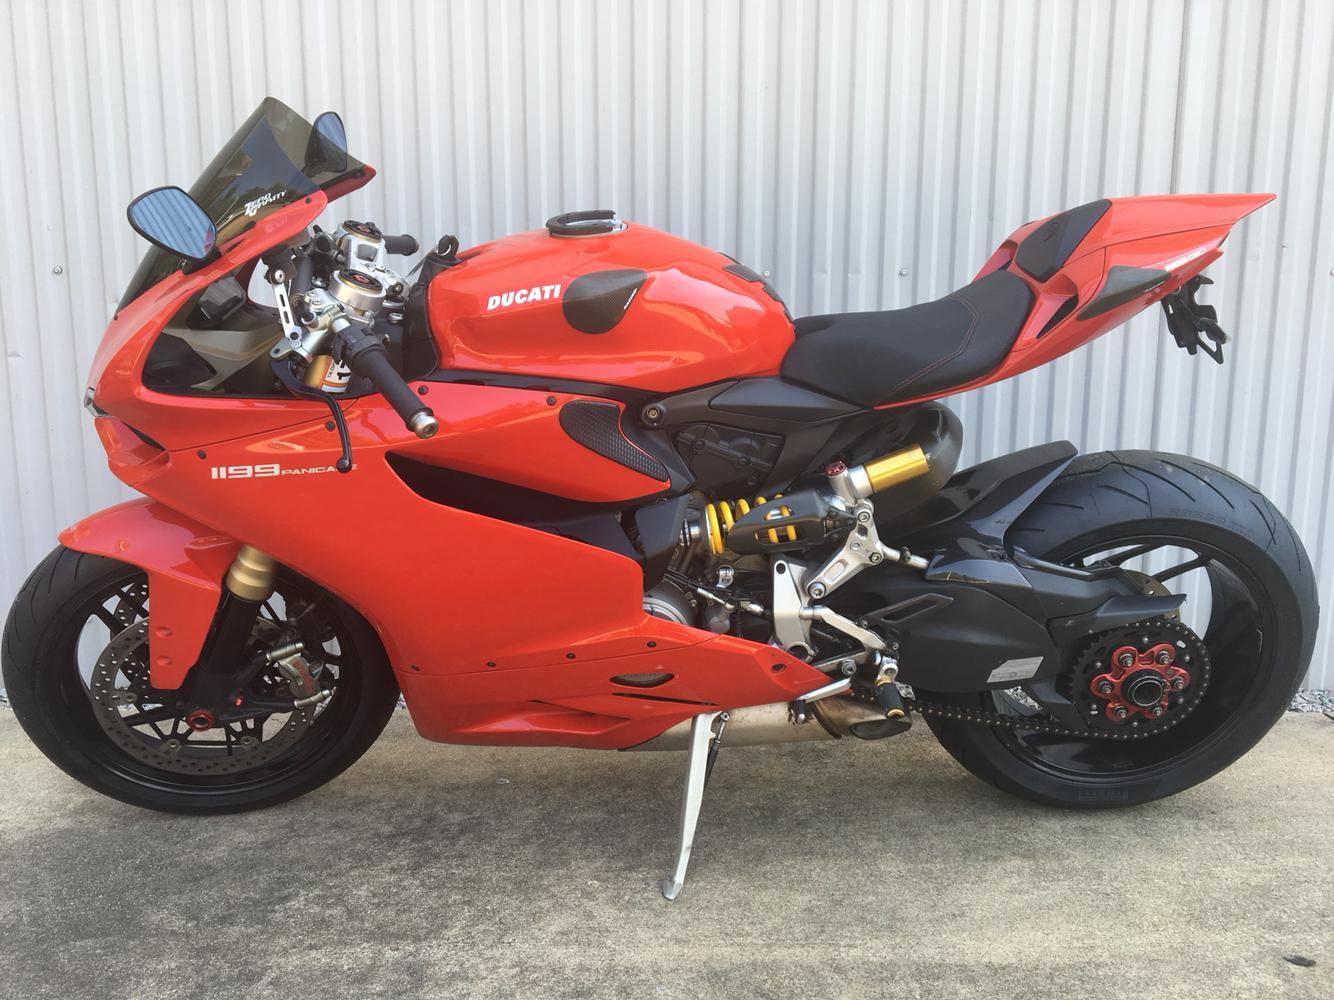 2013 Ducati 1199 Panigale ABS for sale in Woodbridge, VA